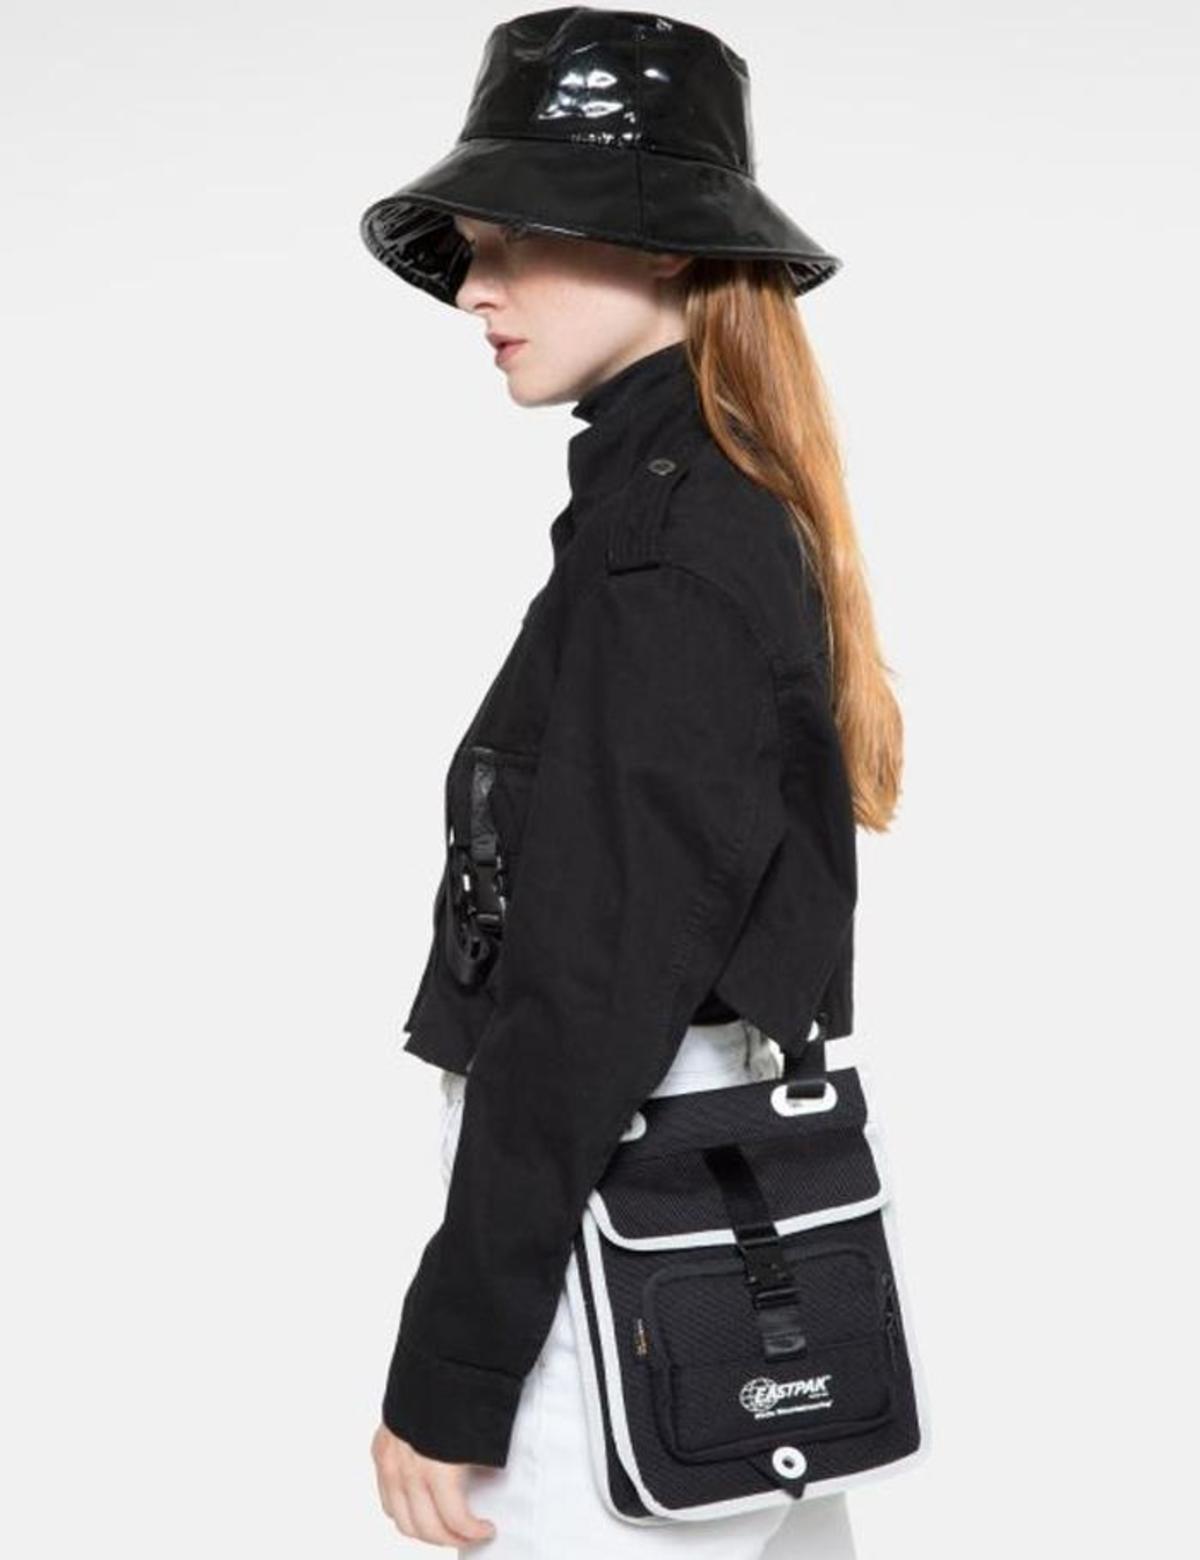 fa935c1914 Eastpak x White Mountaineering Musette Hip Bag - Dark Black